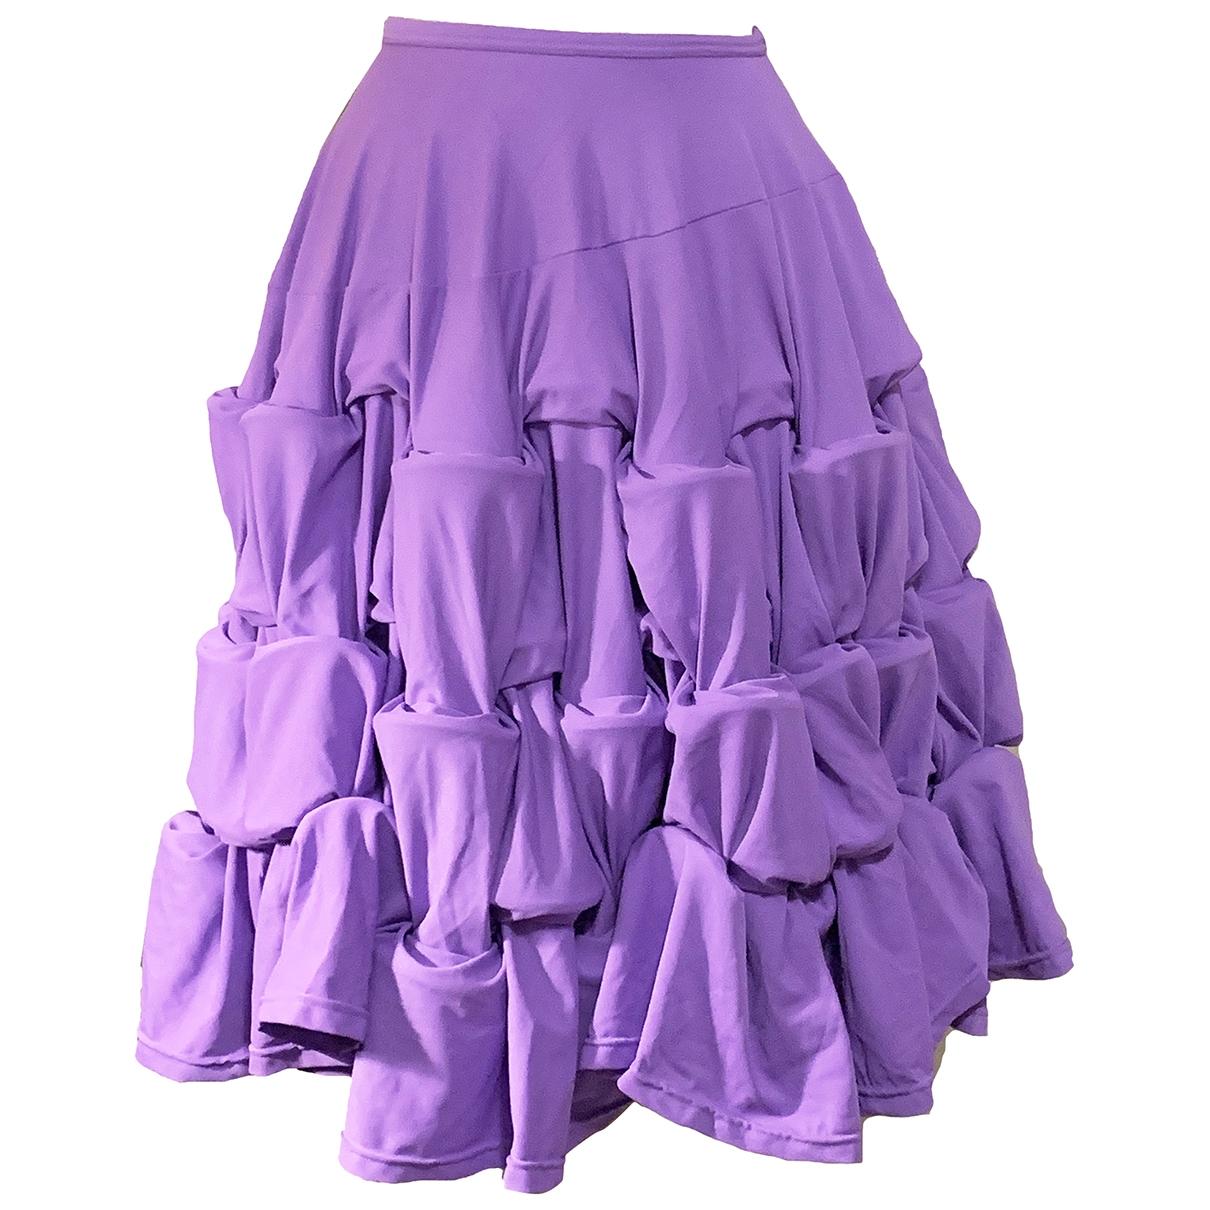 Comme Des Garcons \N Purple skirt for Women S International